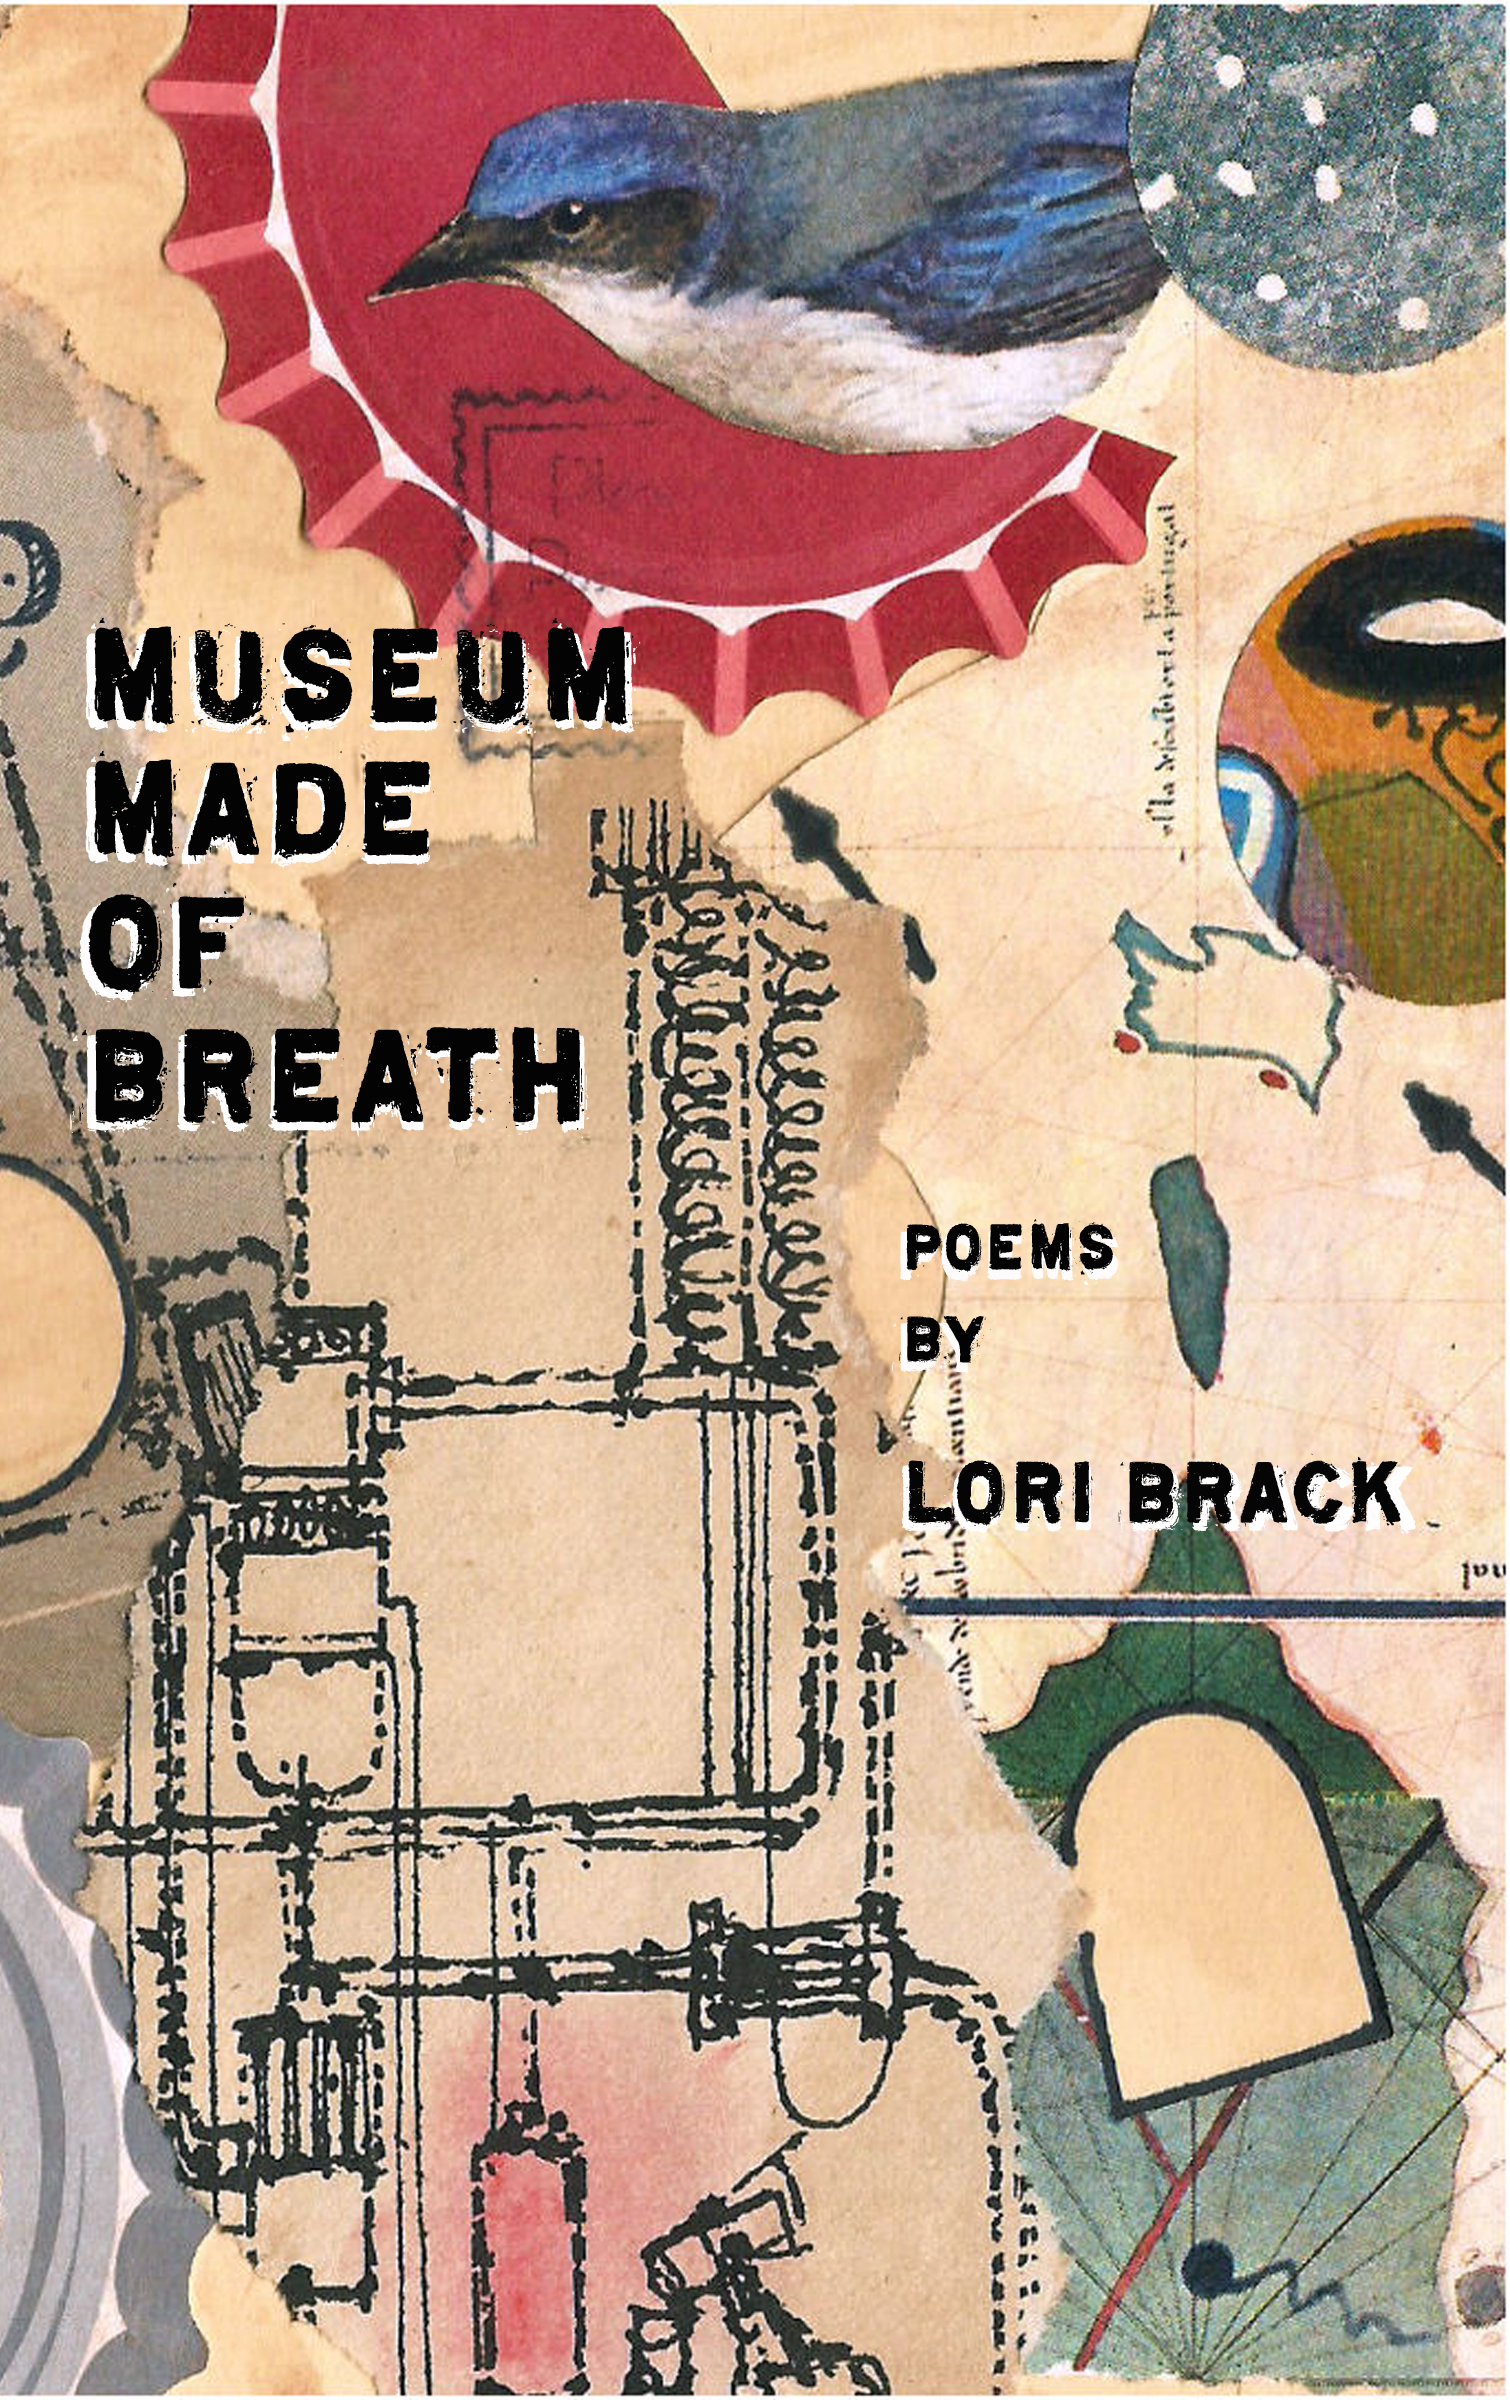 Lori Brack, front cover  2, 5-10-18.jpg